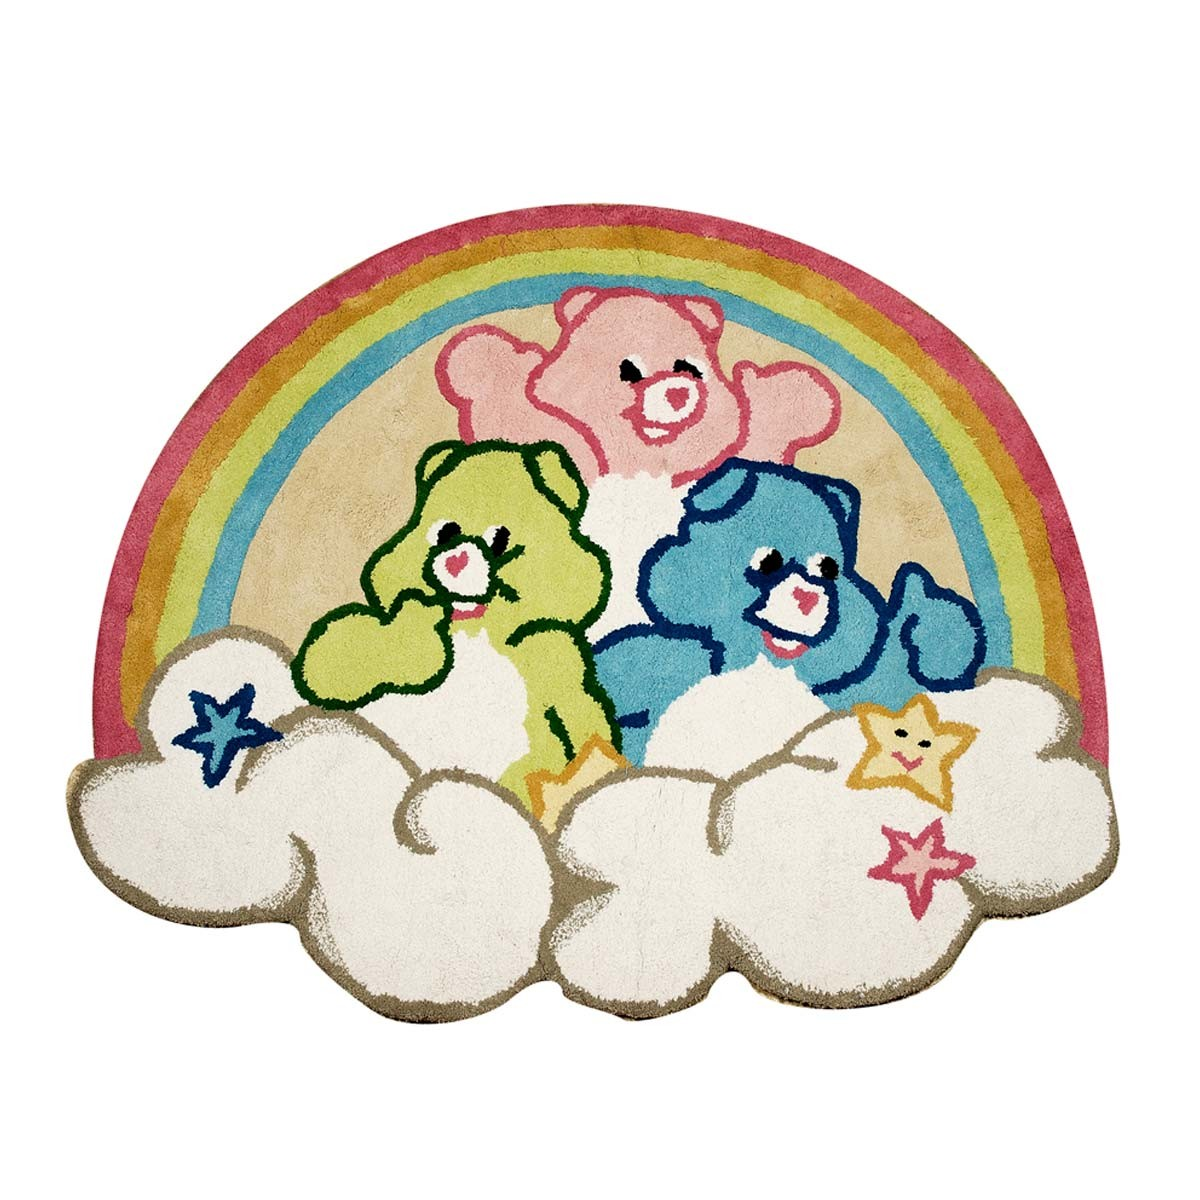 Covor copii multicolor din bumbac 100% Teddy Star bbc 130x120